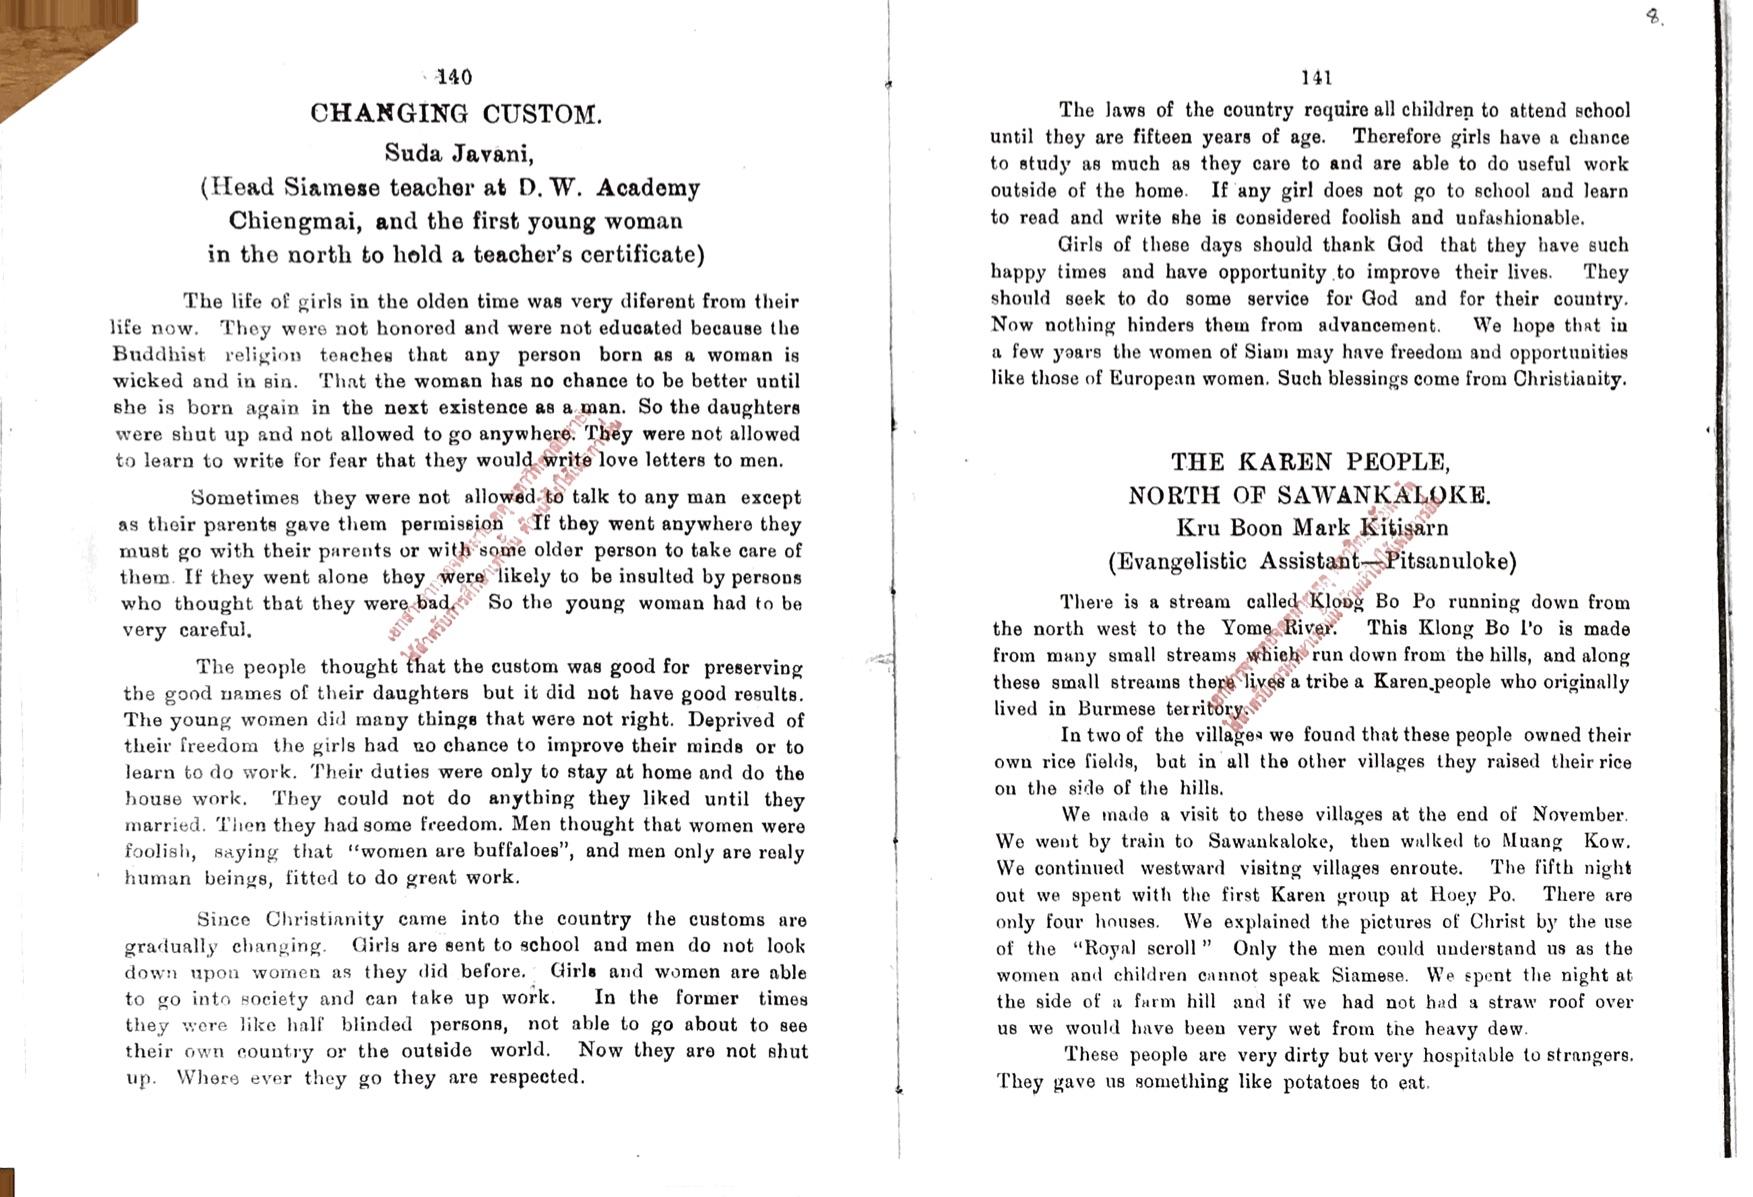 "Suda Javani, ""Changing Custom"", Siam Outlook, v.4, no.4, April 1925, 140-141, Payap University Archives"